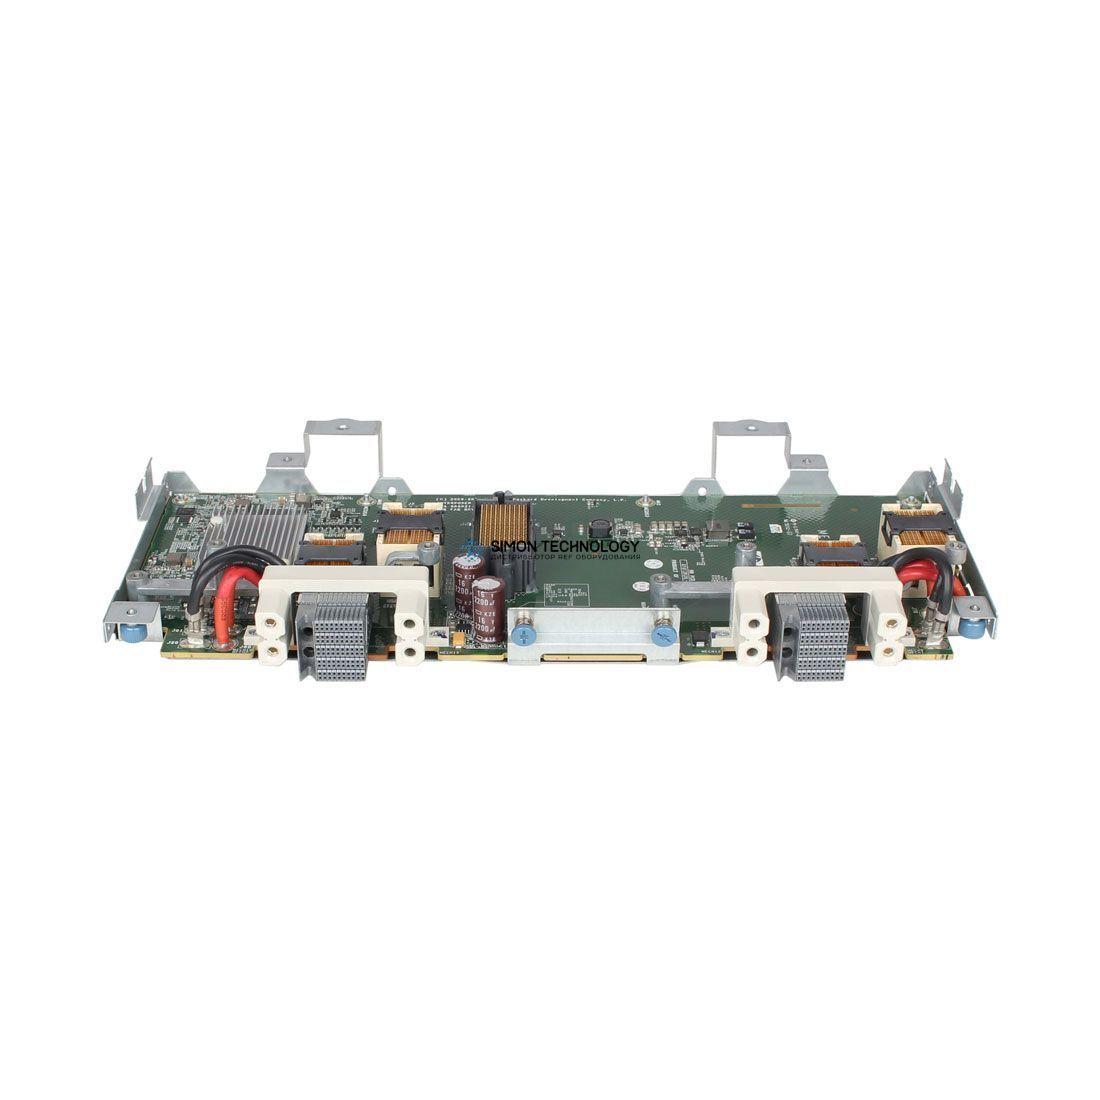 HP HPE BD INTERPOSER 680 R2 (708066-001)